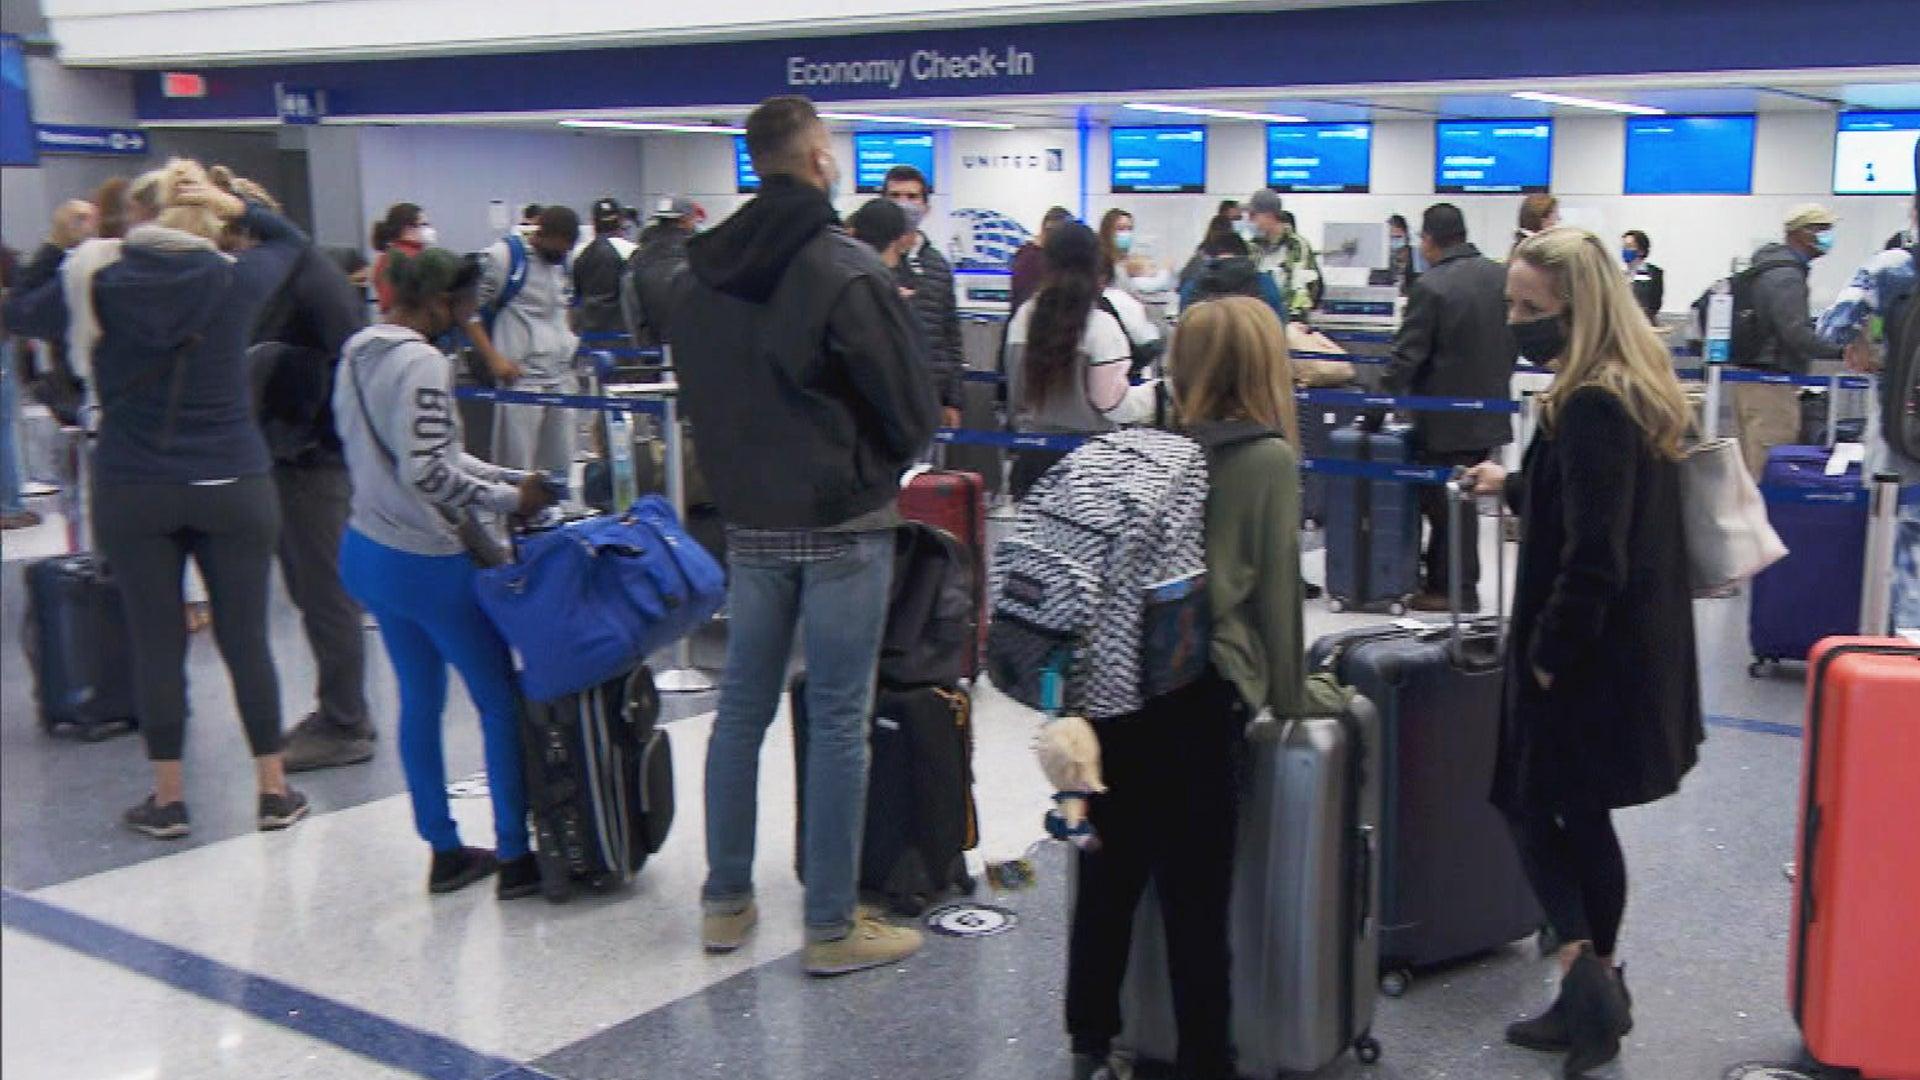 TSA Screens 2M Travelers Ahead of Thanksgiving Holiday Despite CDC Warnings to Stay Put